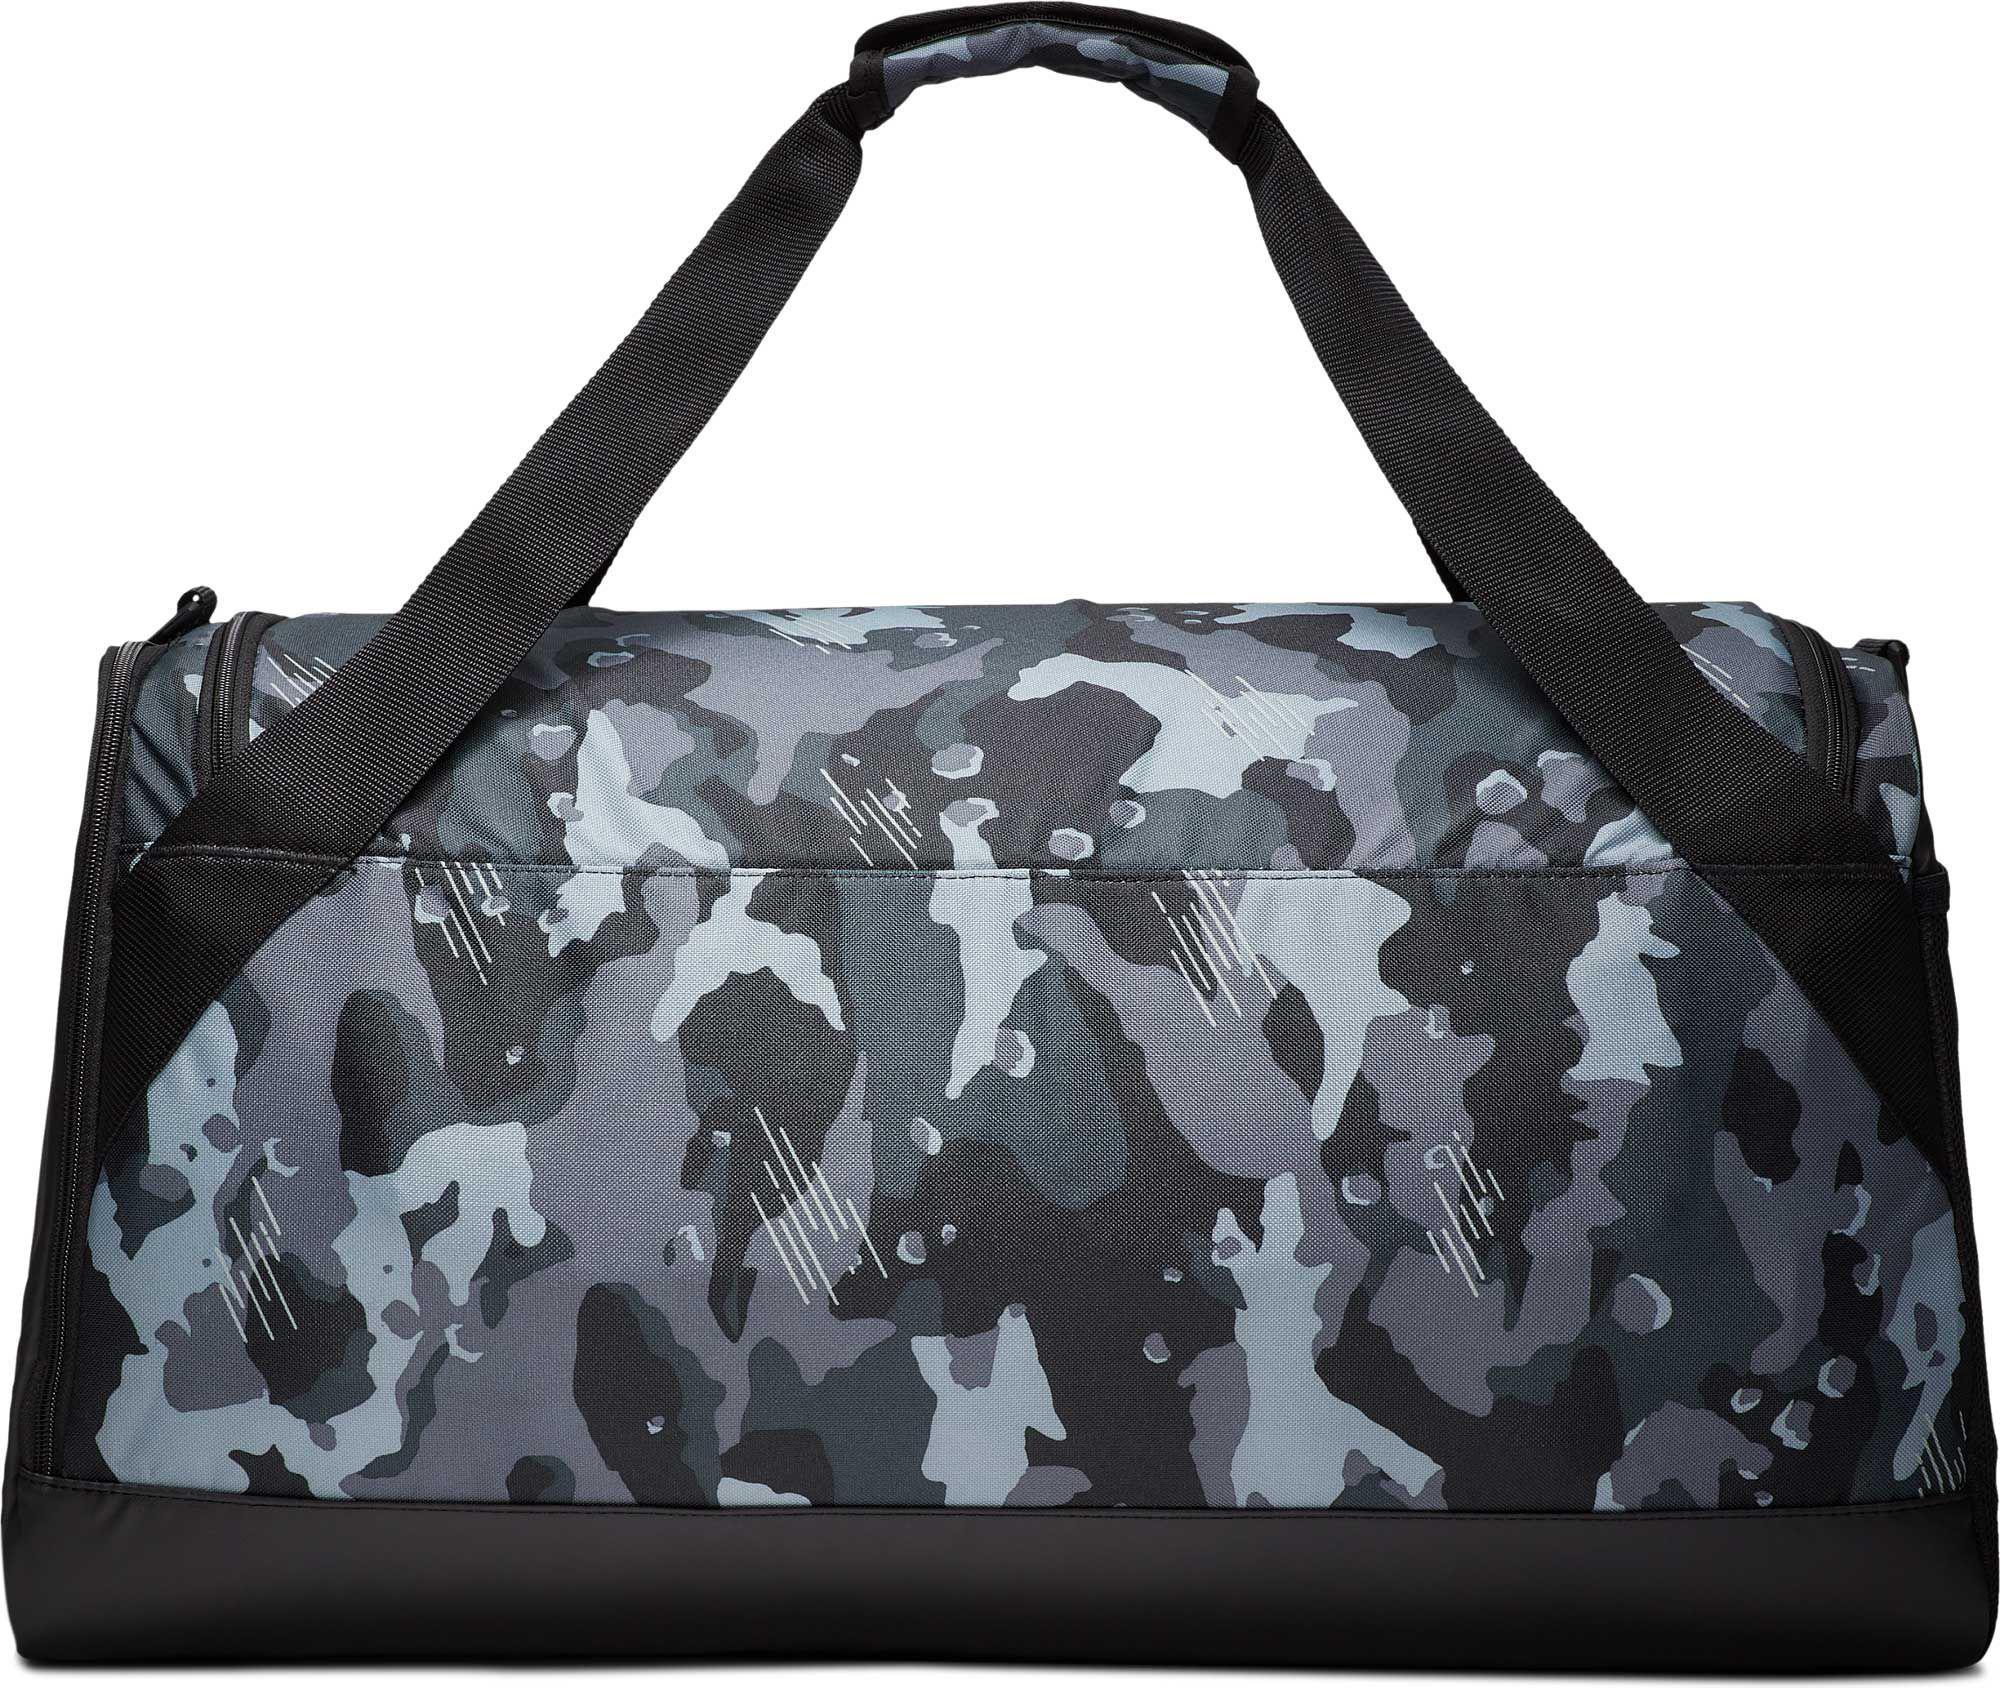 Nike - Black Rasilia Medium Printed Training Duffle Bag for Men - Lyst.  View fullscreen 2cbe550a72